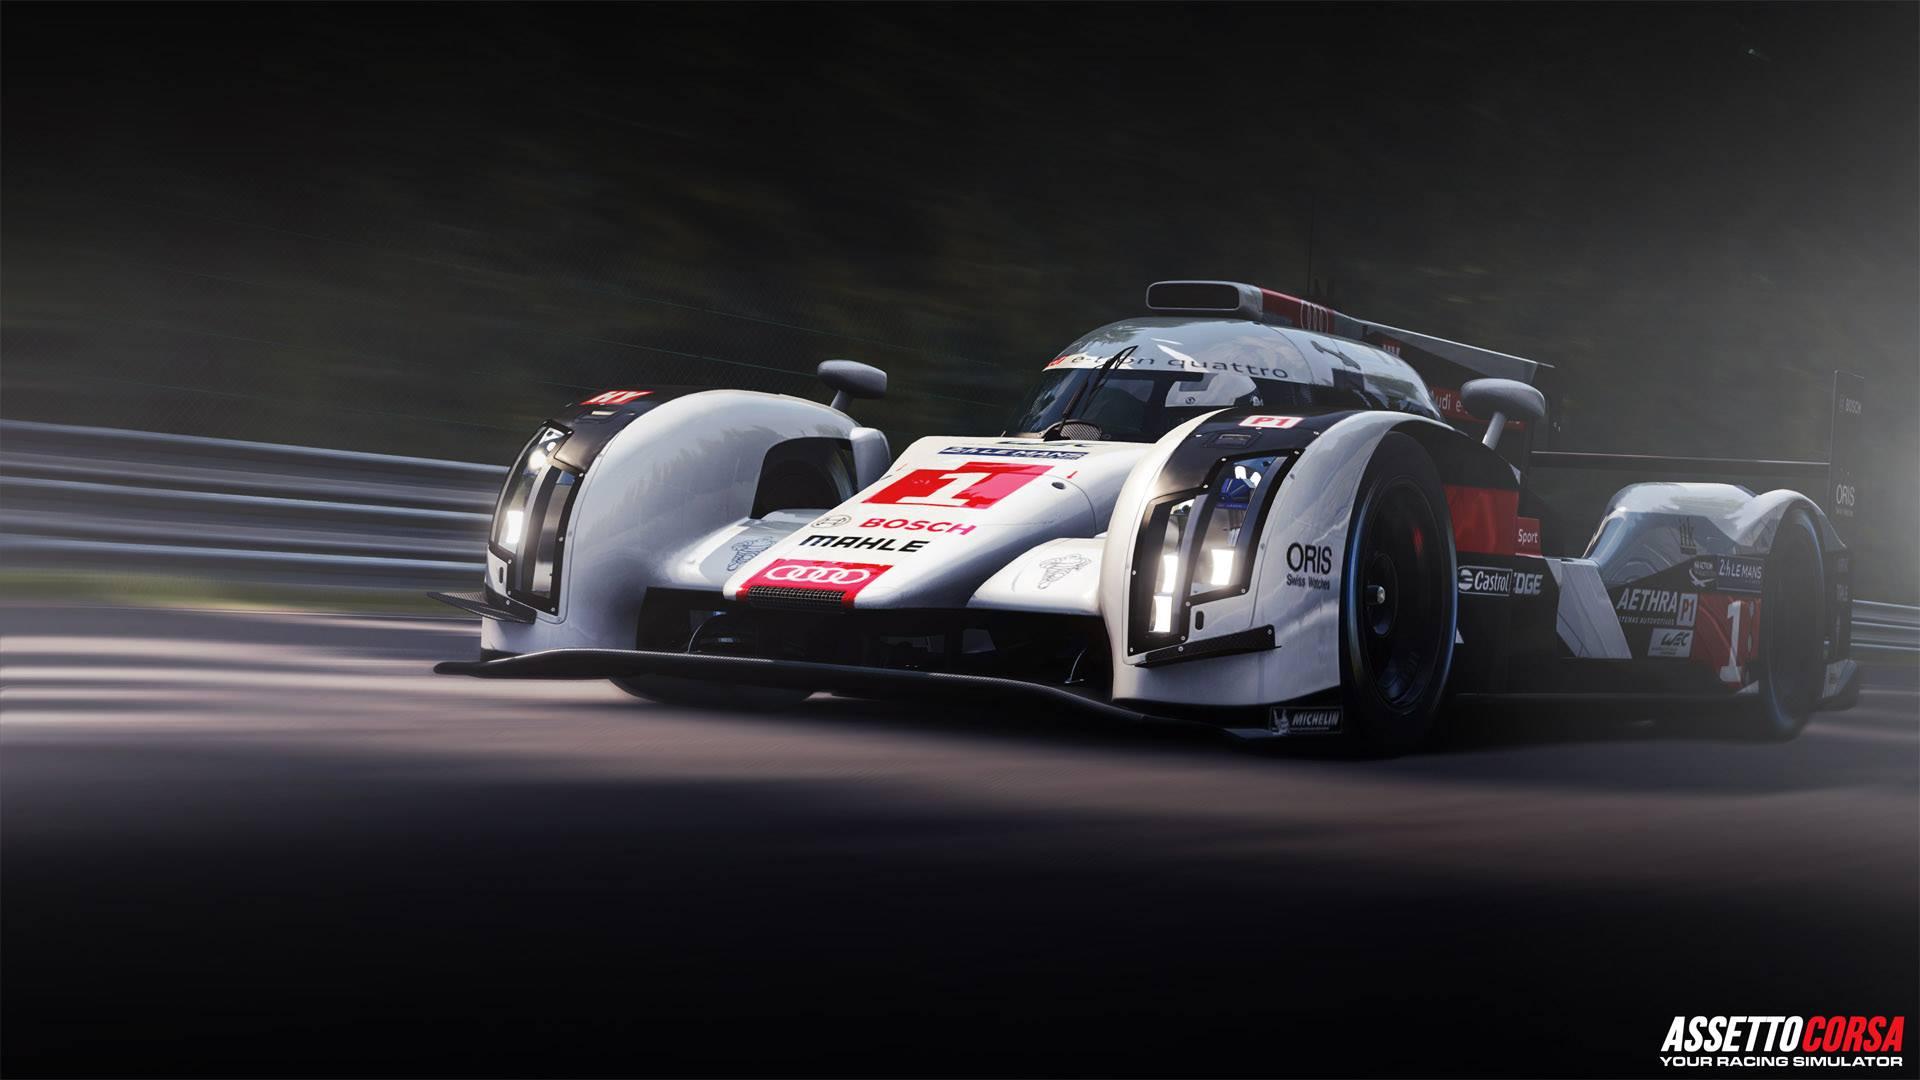 Assetto Corsa Ready To Race DLC Audi R18 e-tron Quattro 2014